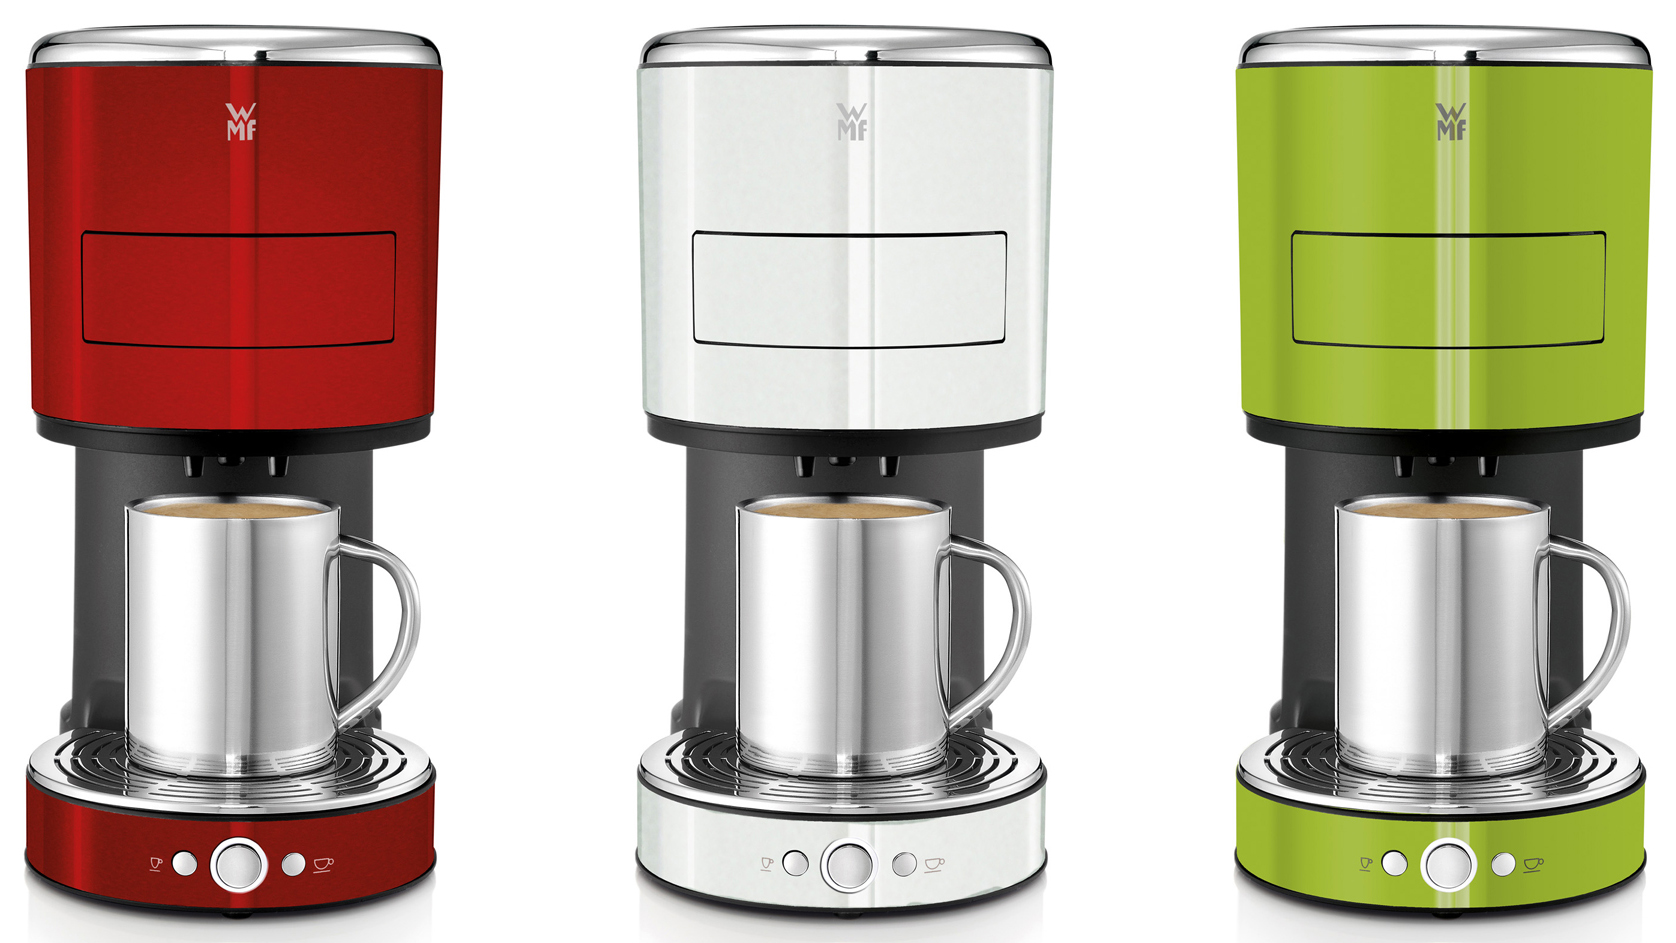 WMF Kaffeemaschine Lono Color – Kaffeepadmaschine in drei  -> Kaffeemaschine Wmf